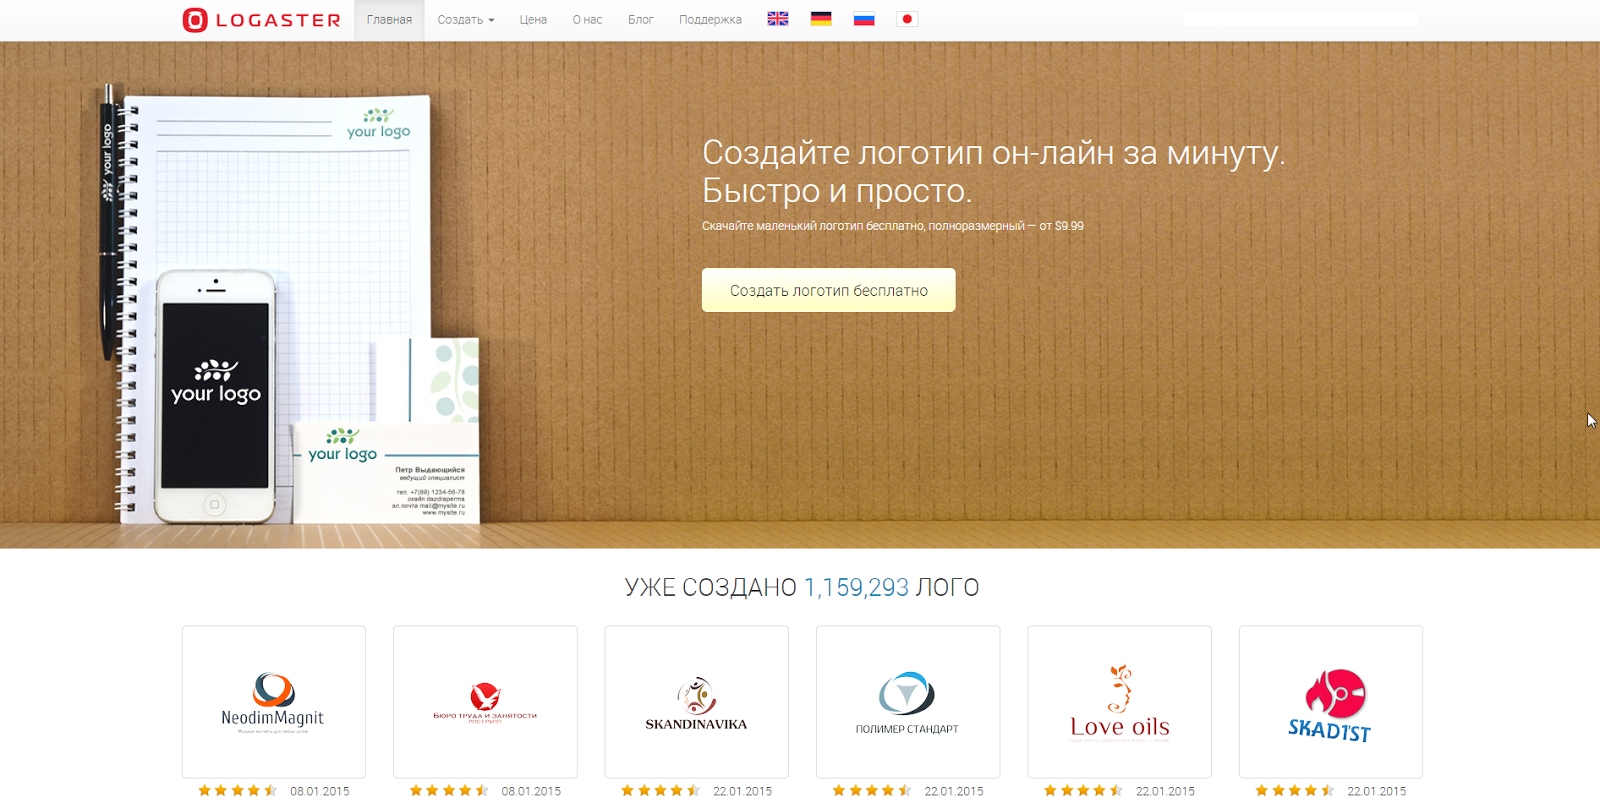 генератор логотипов онлайн: